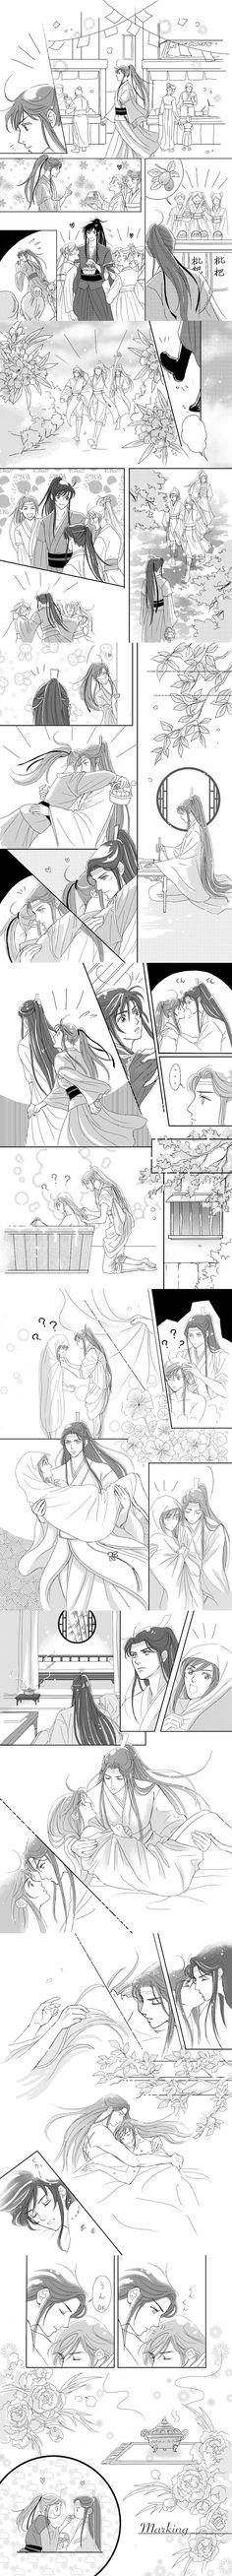 Anime Boy Long Hair, Mpreg Anime, Link Meme, Chibi Sketch, Hetalia Funny, Chinese Cartoon, Fantasy Art Men, The Grandmaster, Anime Eyes